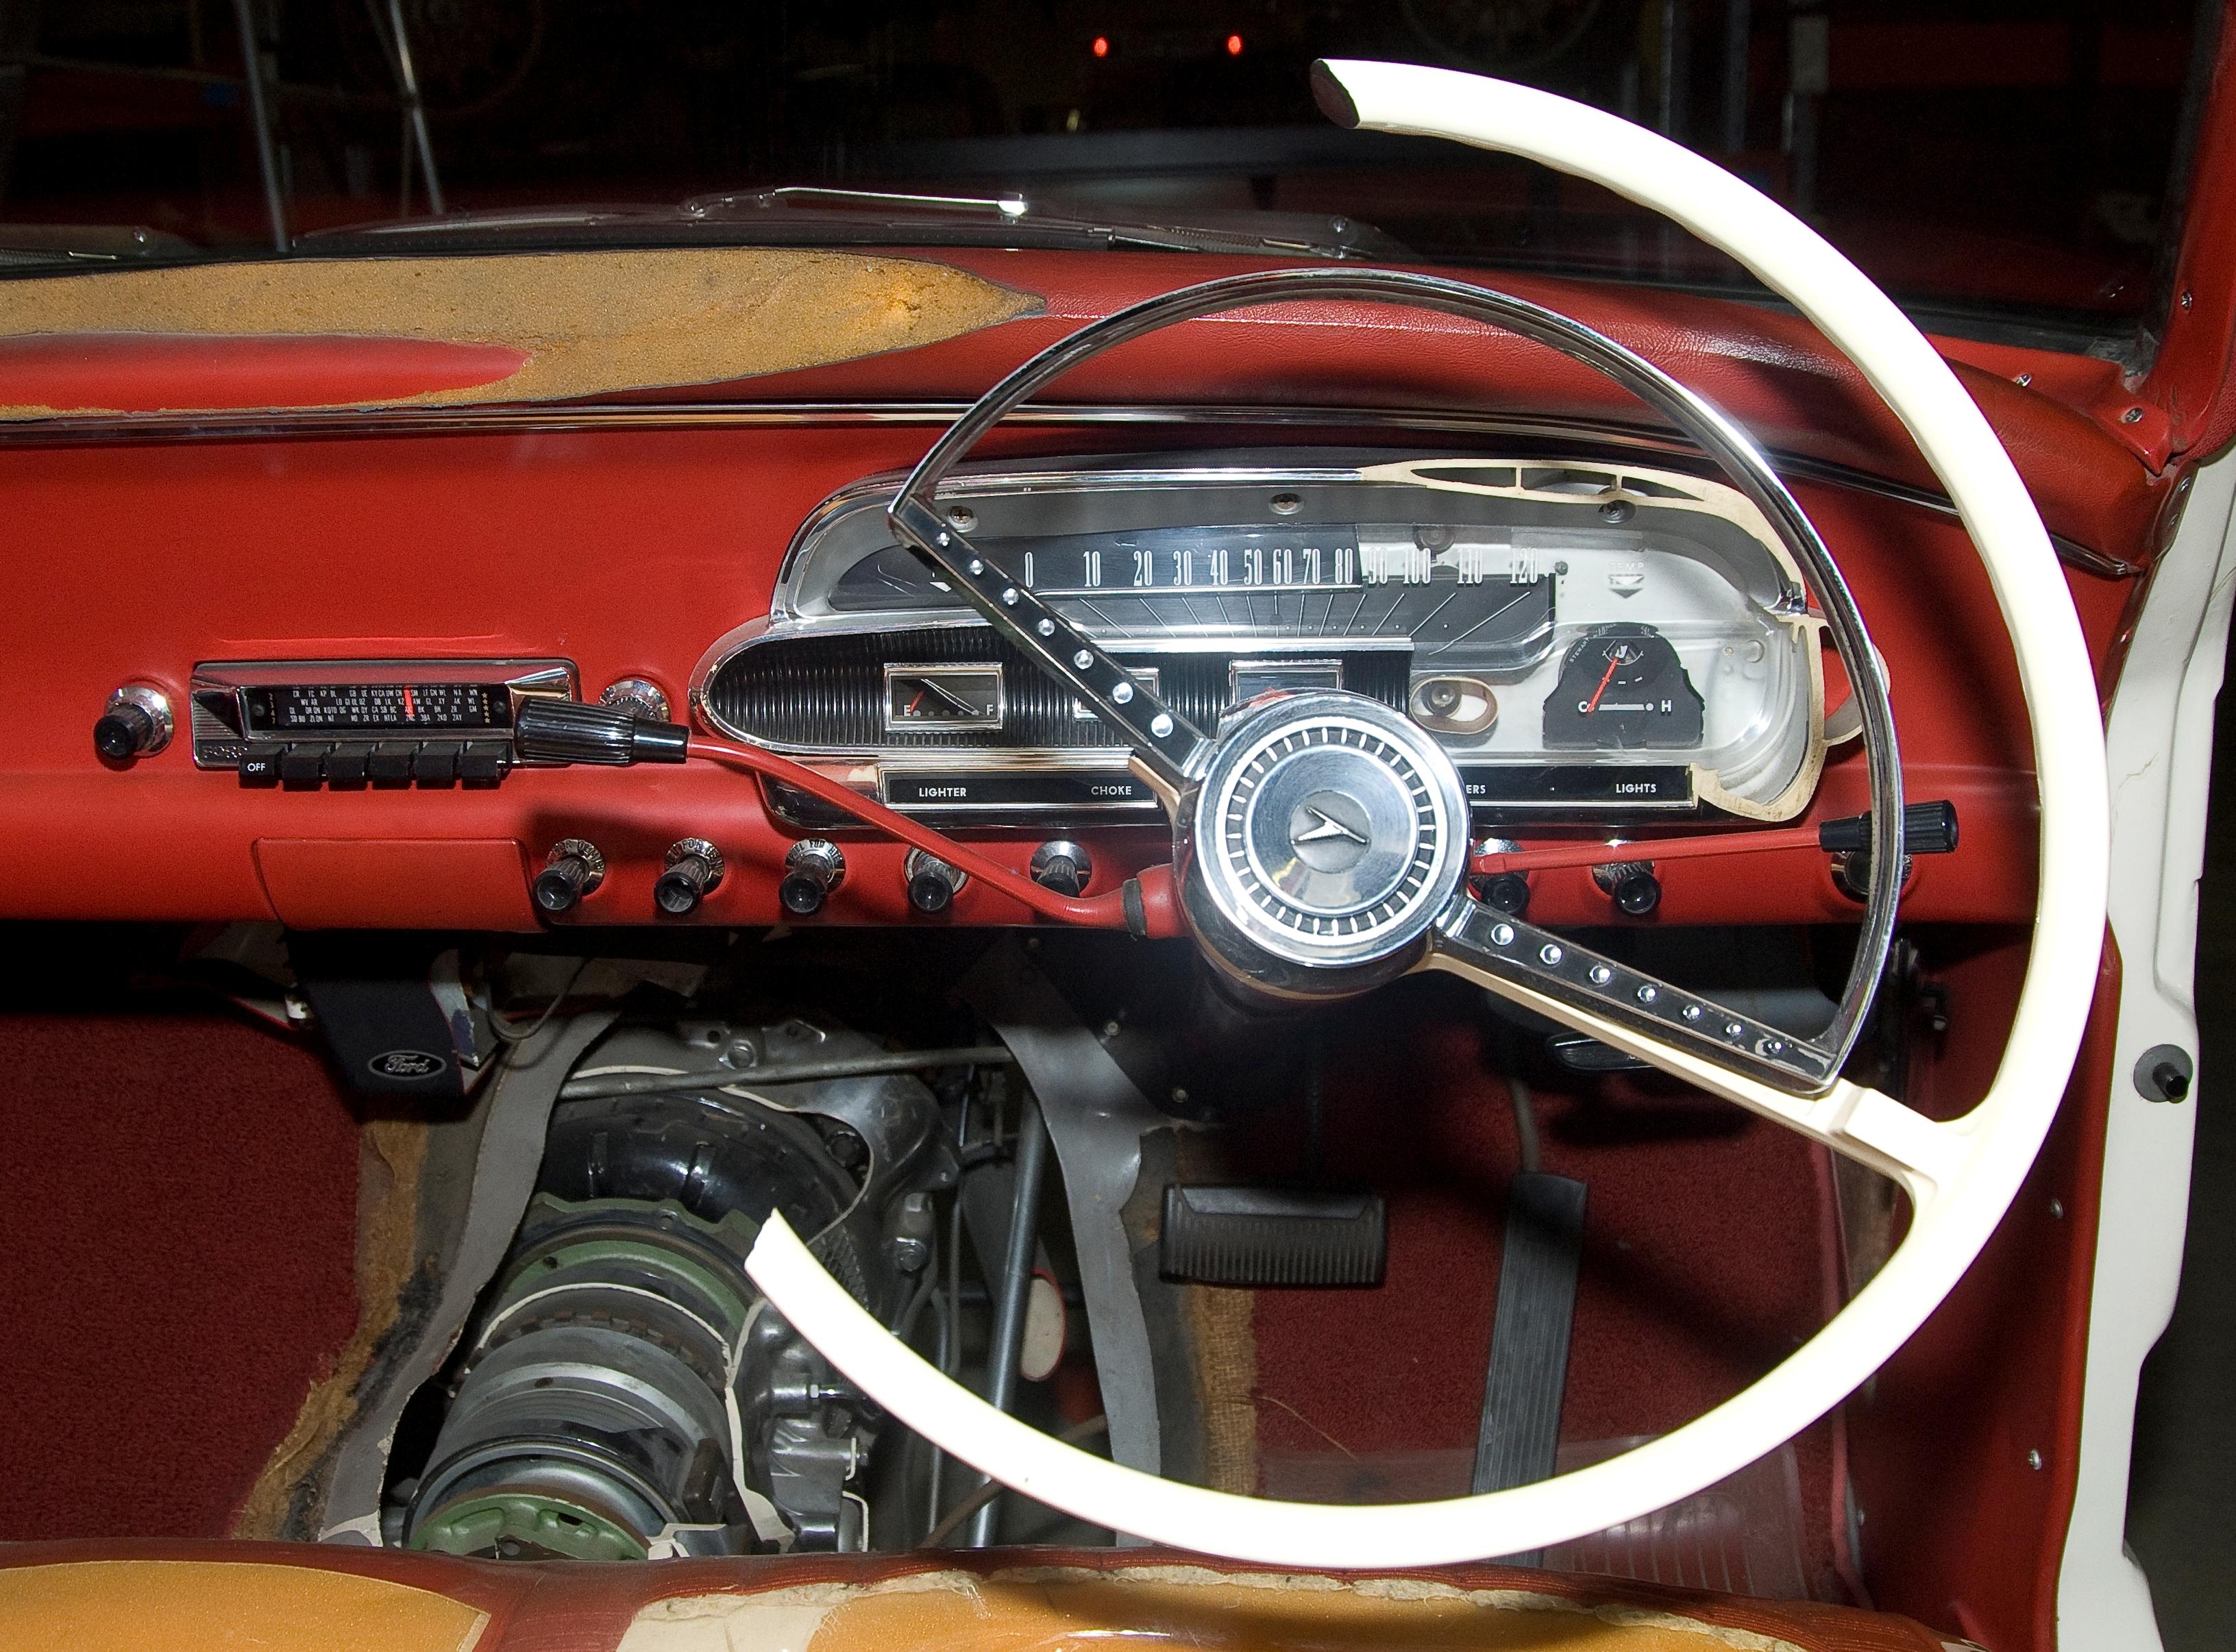 Ford Falcon I (XK, XL, XM, XP) 1960 - 1966 Sedan #2